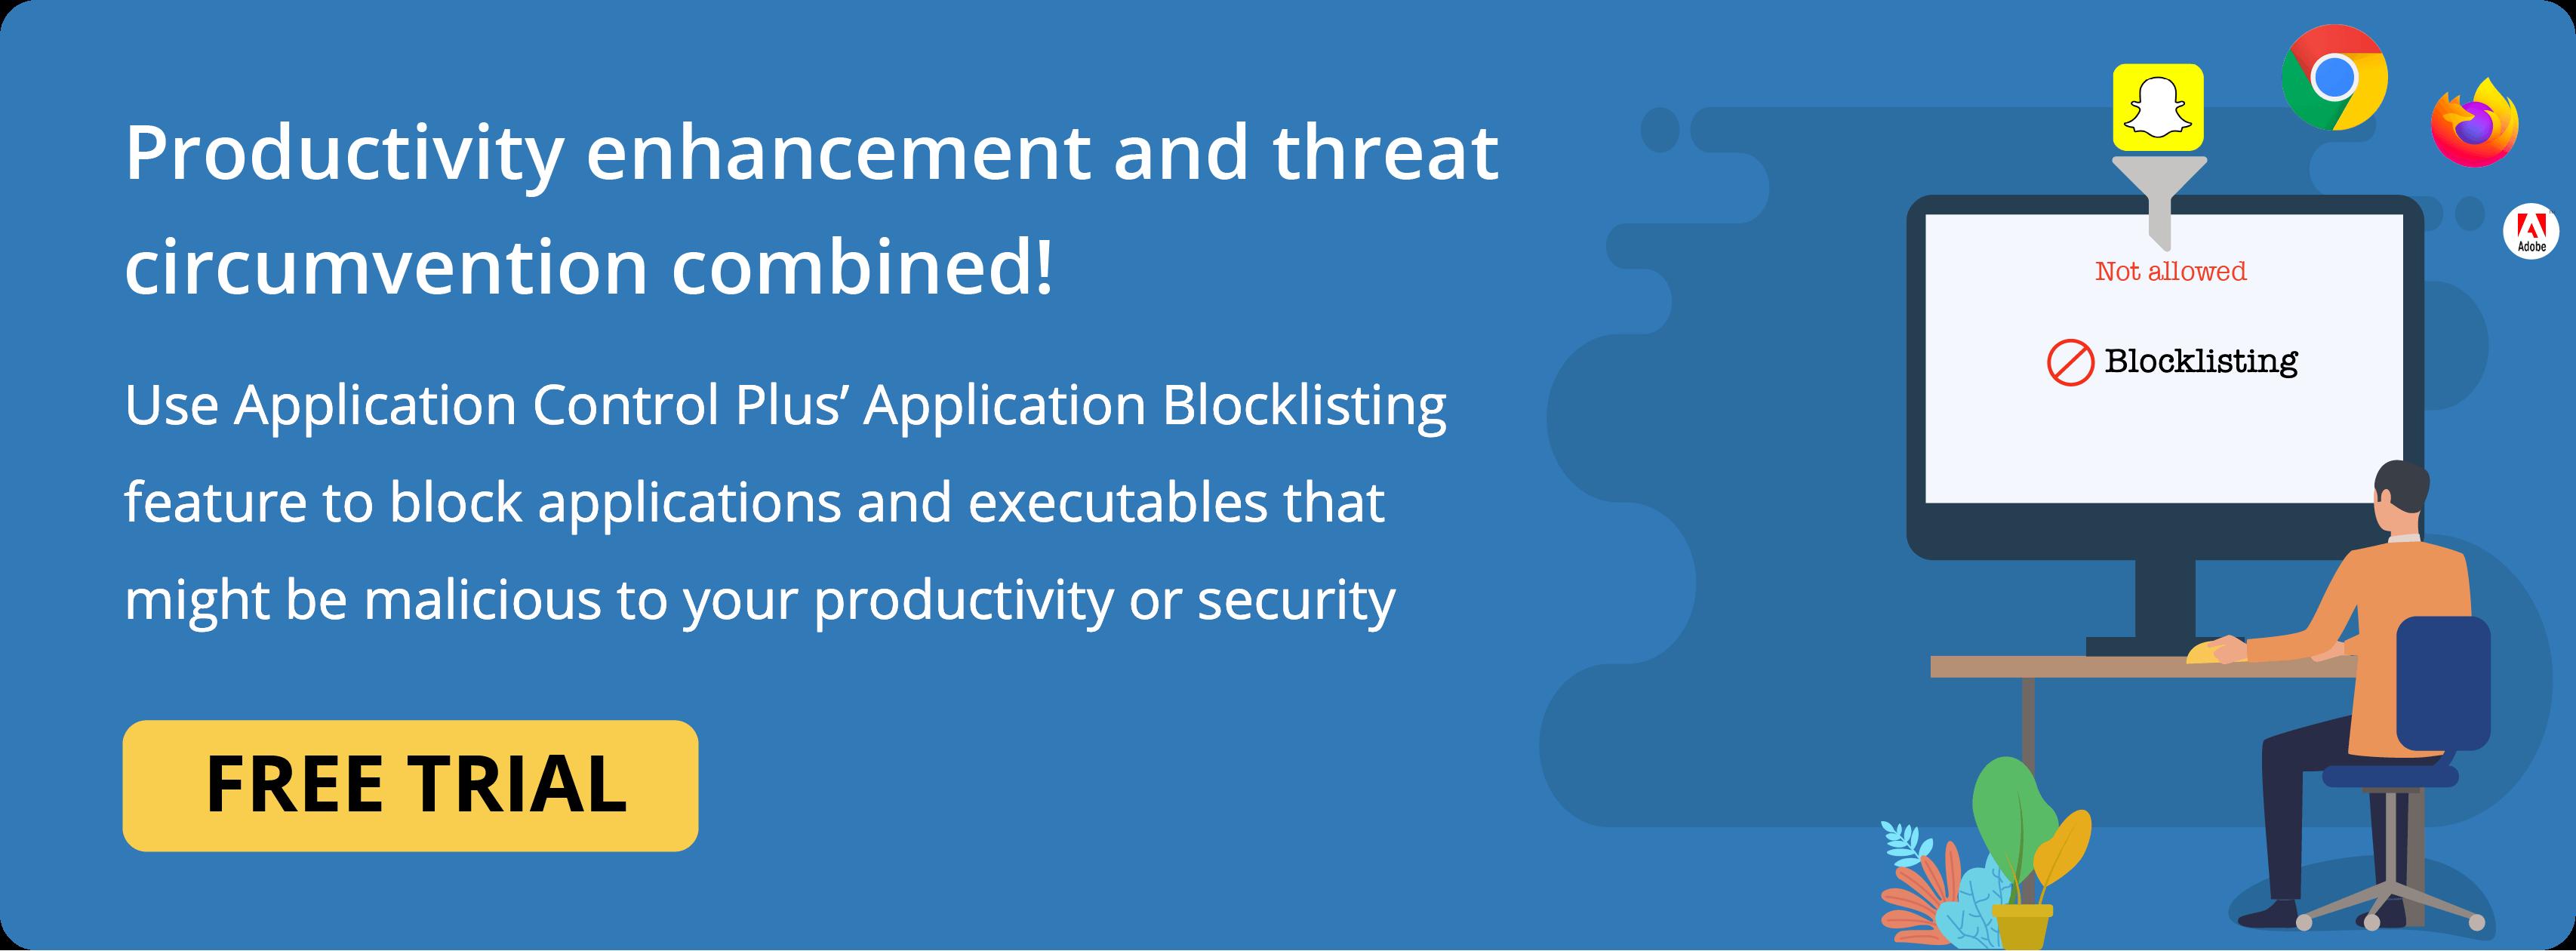 Application Blacklisting Software